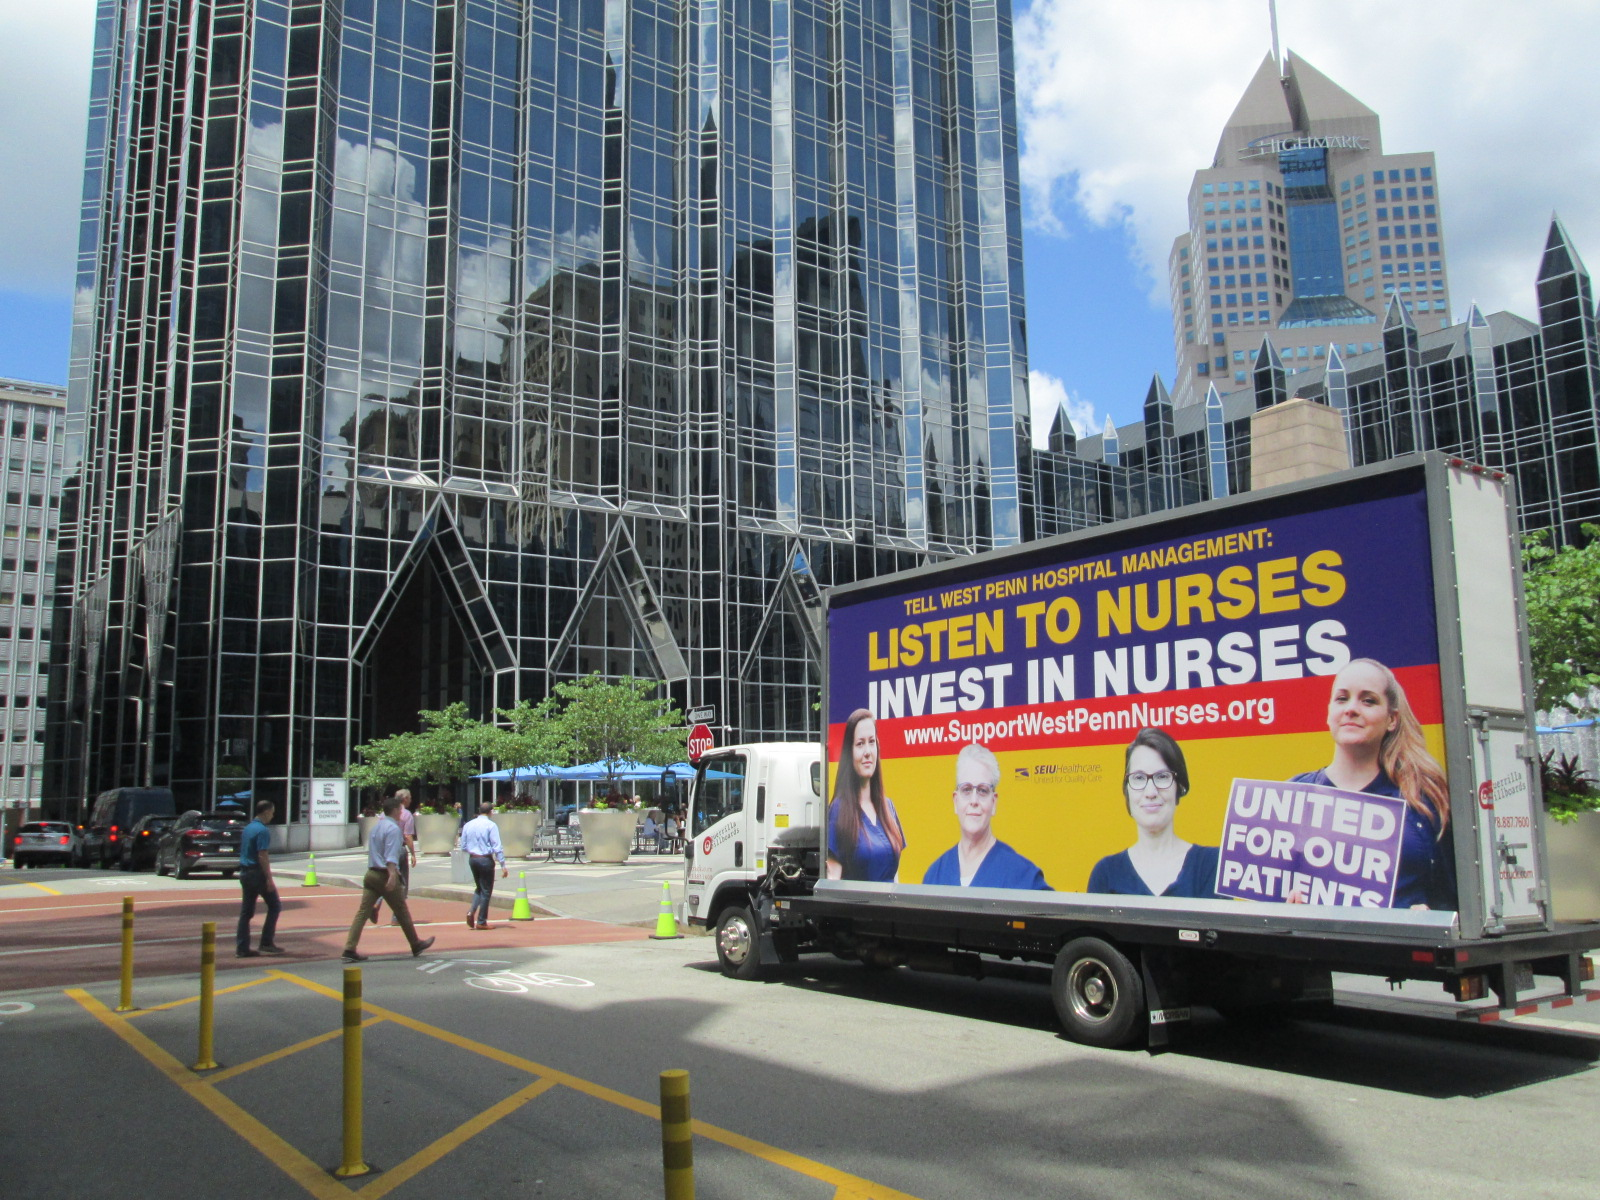 West Penn Nurses mobile billboard ad in downtown Pittsburgh